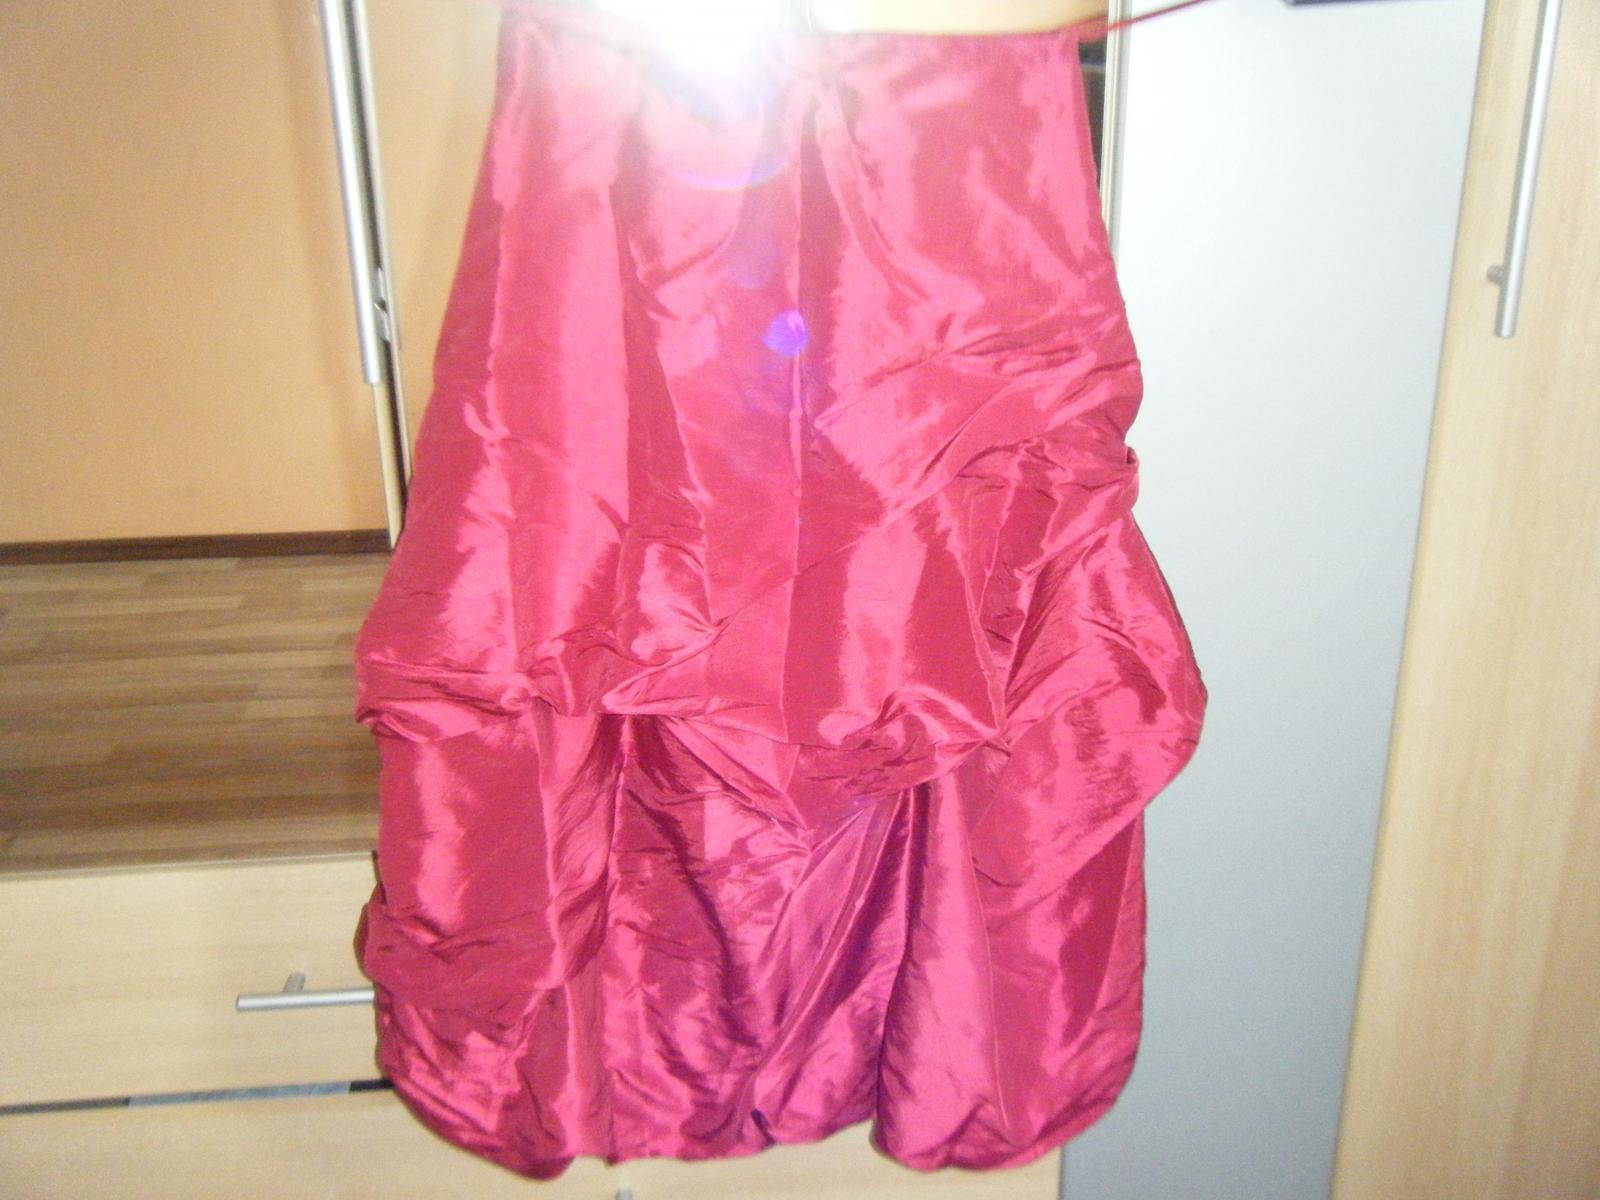 suknovy kostym - Obrázok č. 2